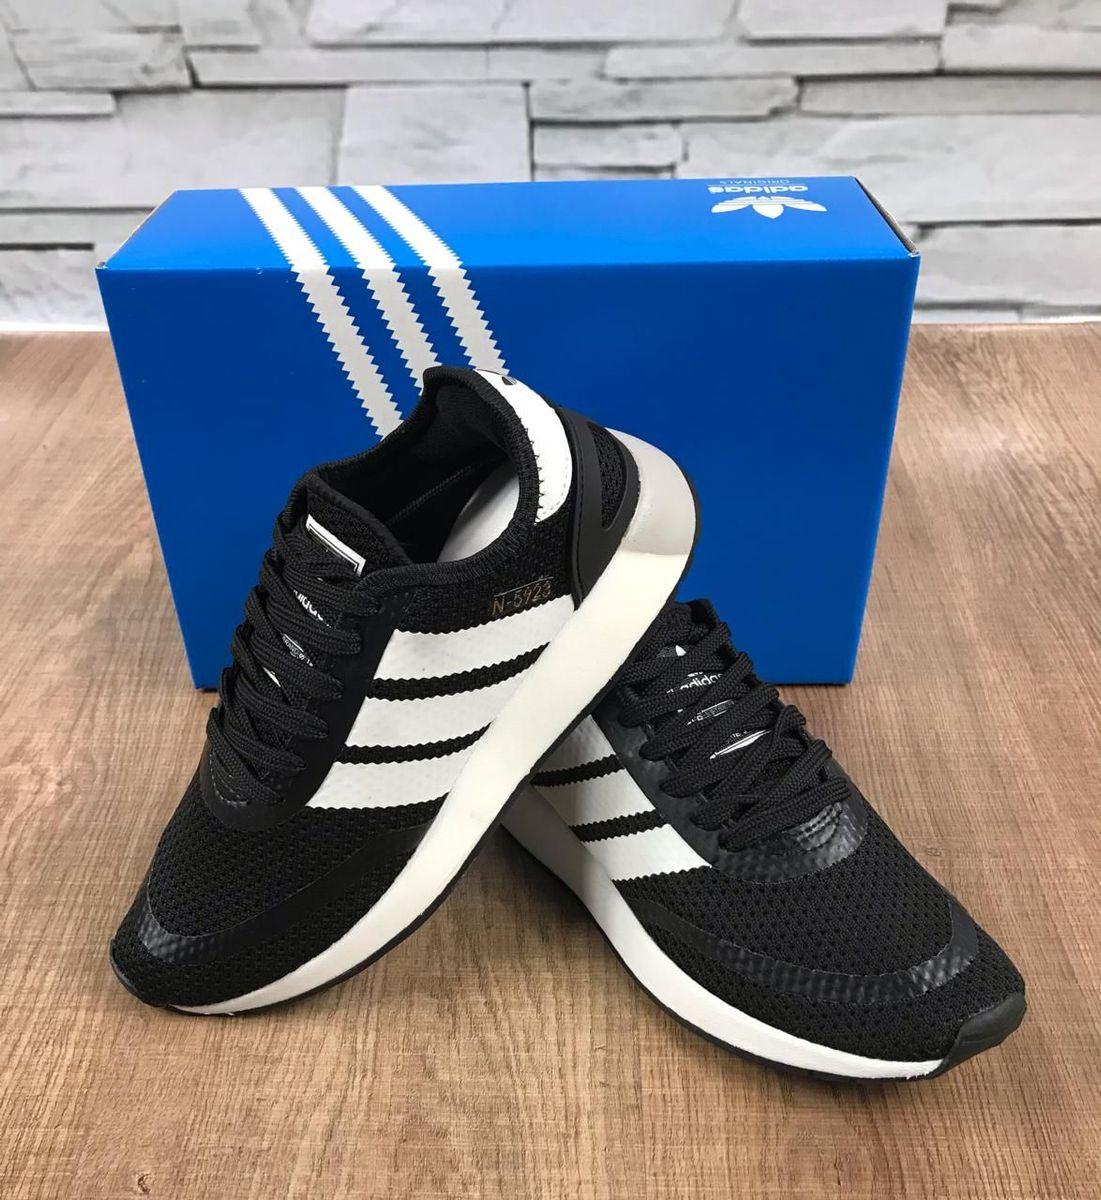 93843b805c8dd tênis adidas preto iniki runner boost masculino original - tênis adidas